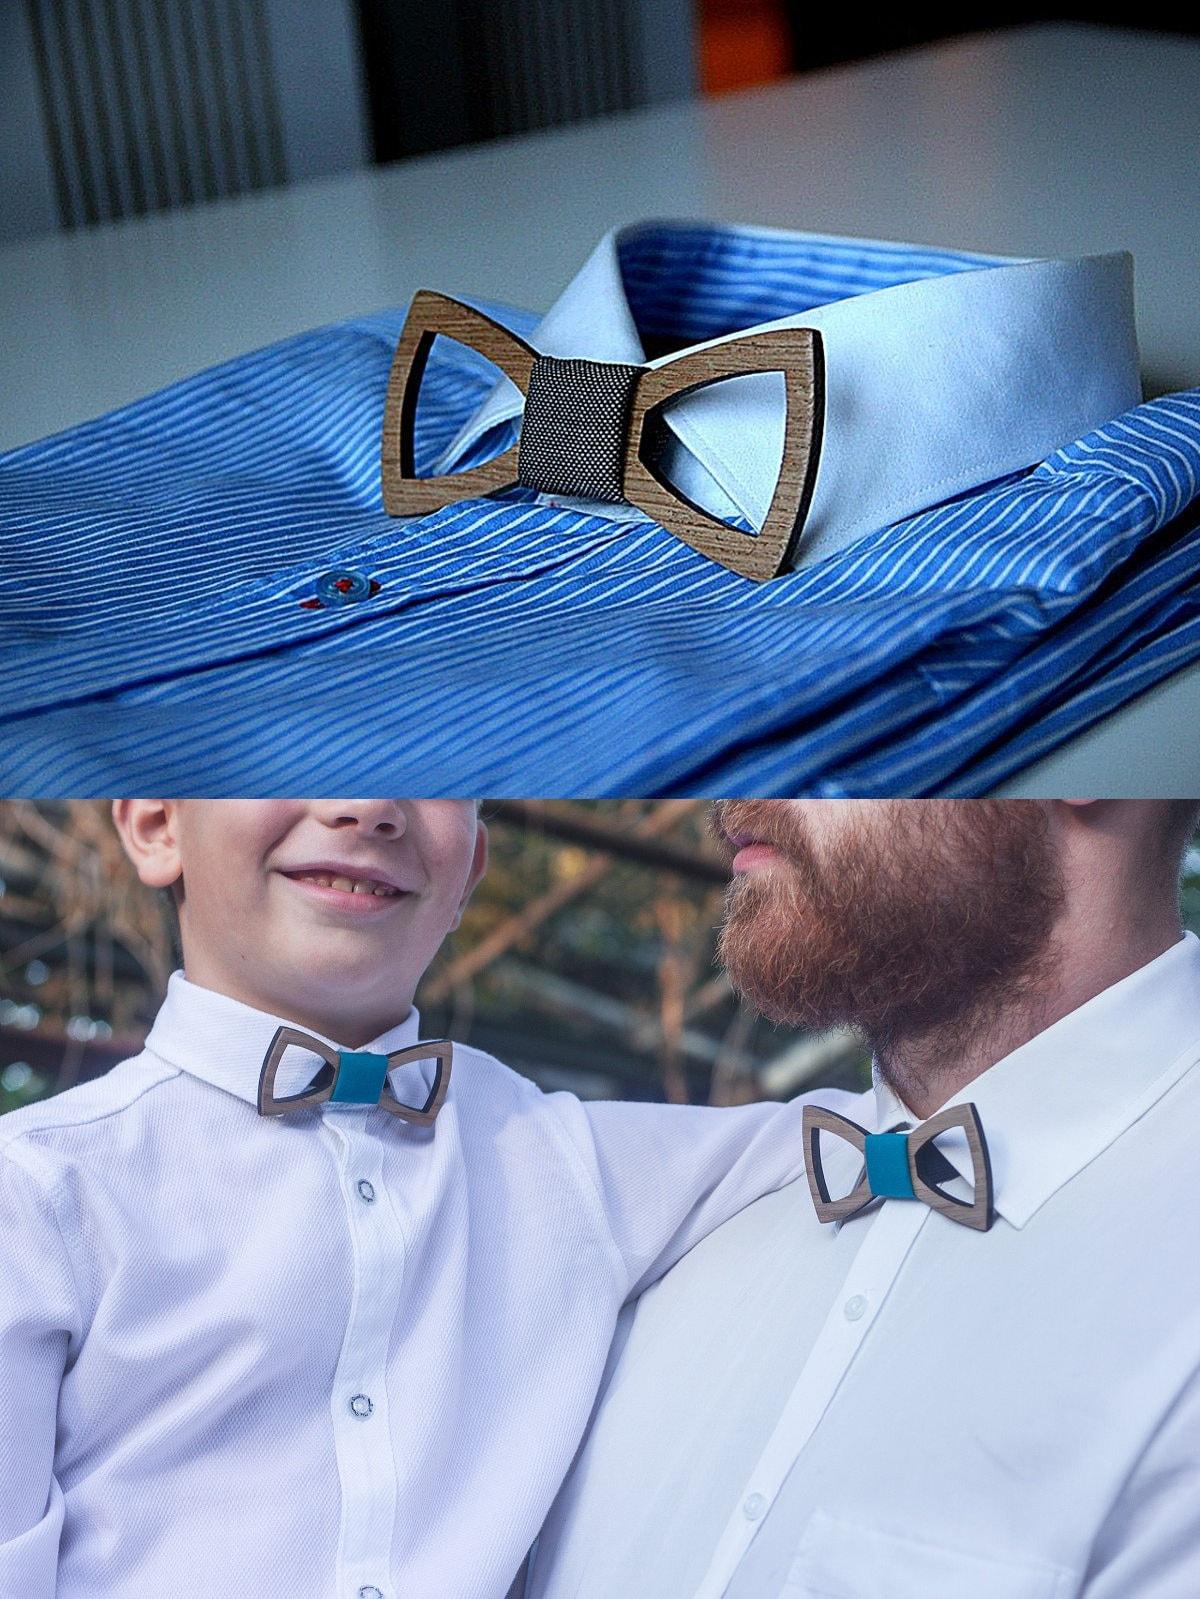 gentlemens bow tie day - HD1200×1599